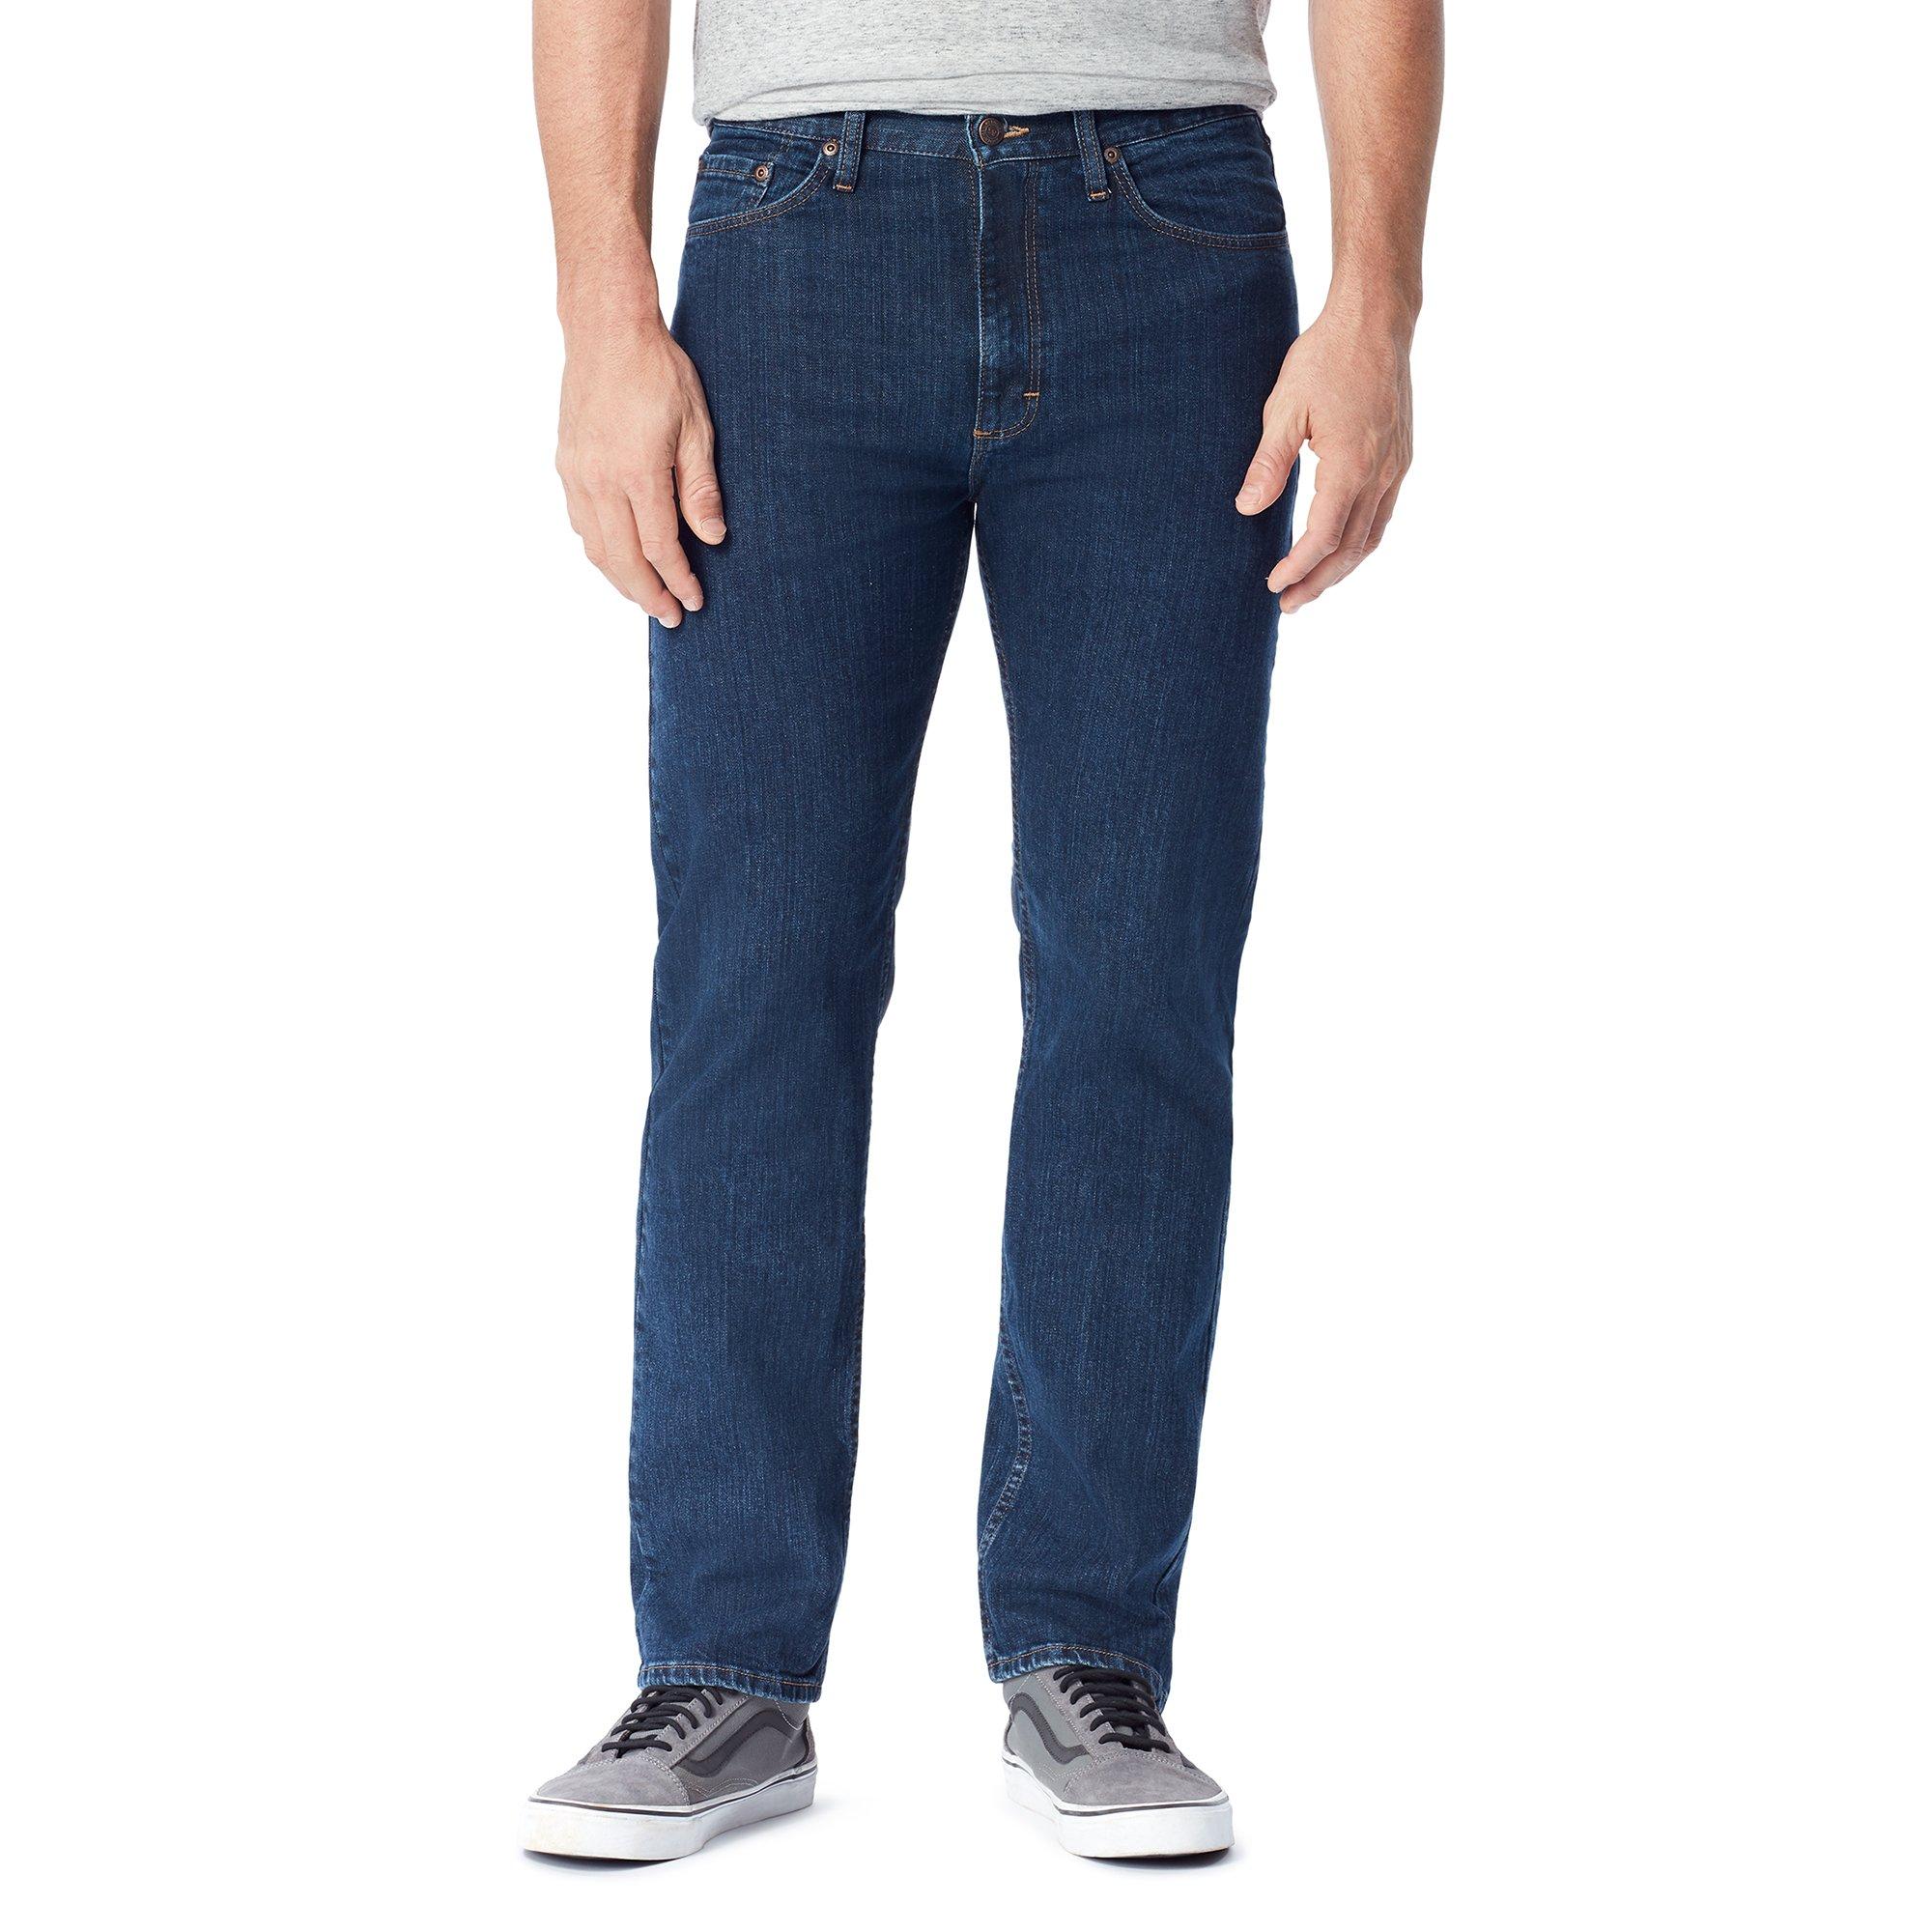 Wrangler Authentics Men's Big and Tall Classic 5-Pocket Regular Fit Jean, Dark Indigo Flex, 34x28